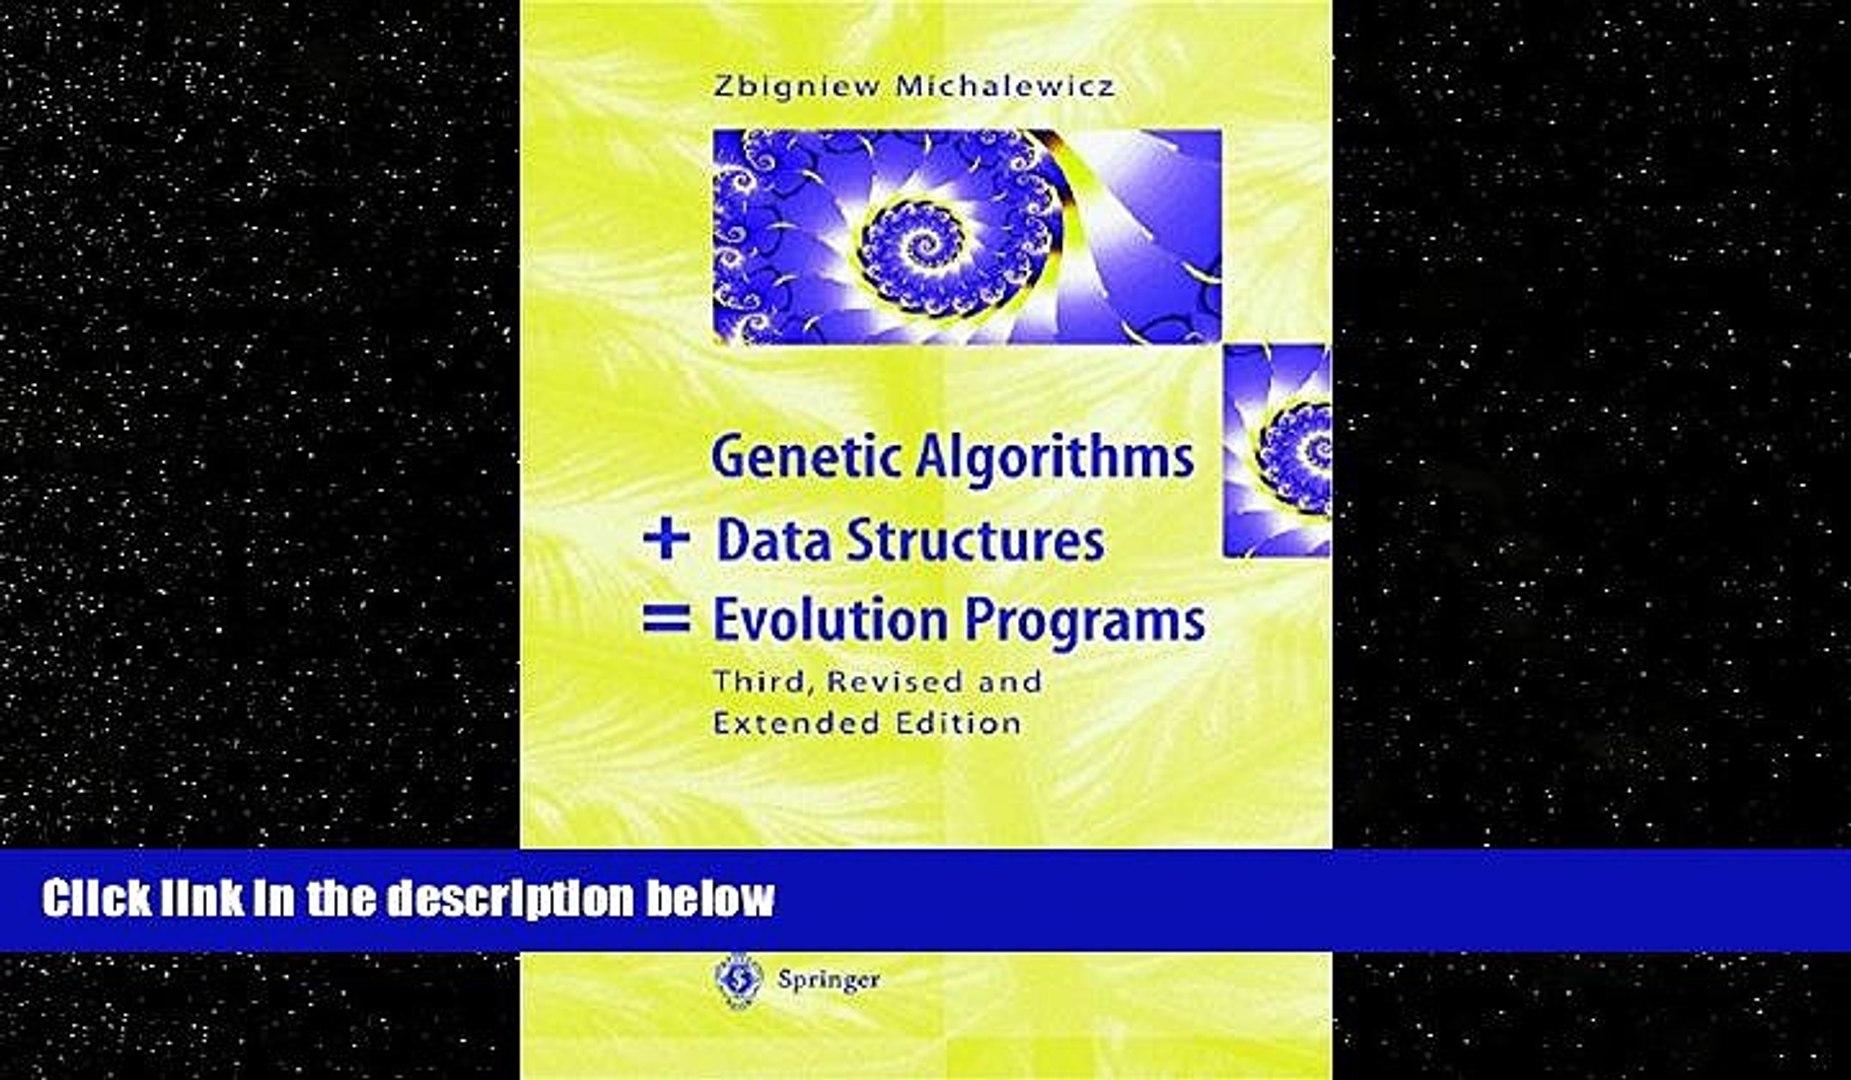 For you Genetic Algorithms + Data Structures = Evolution Programs